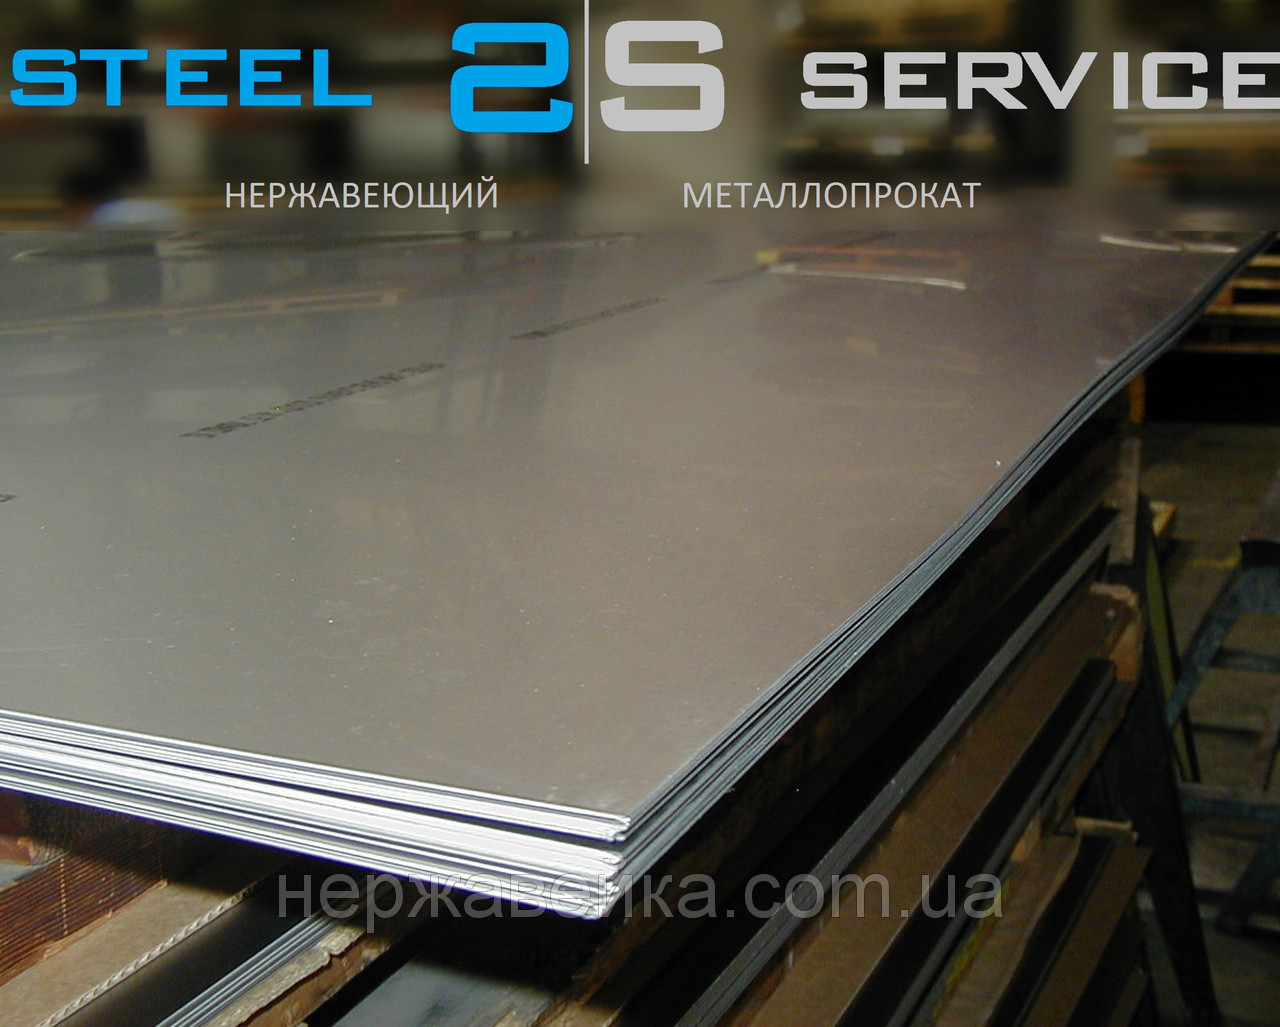 Нержавейка лист 14х1500х6000мм  AISI 316L(03Х17Н14М3) F1 - горячекатанный,  кислотостойкий